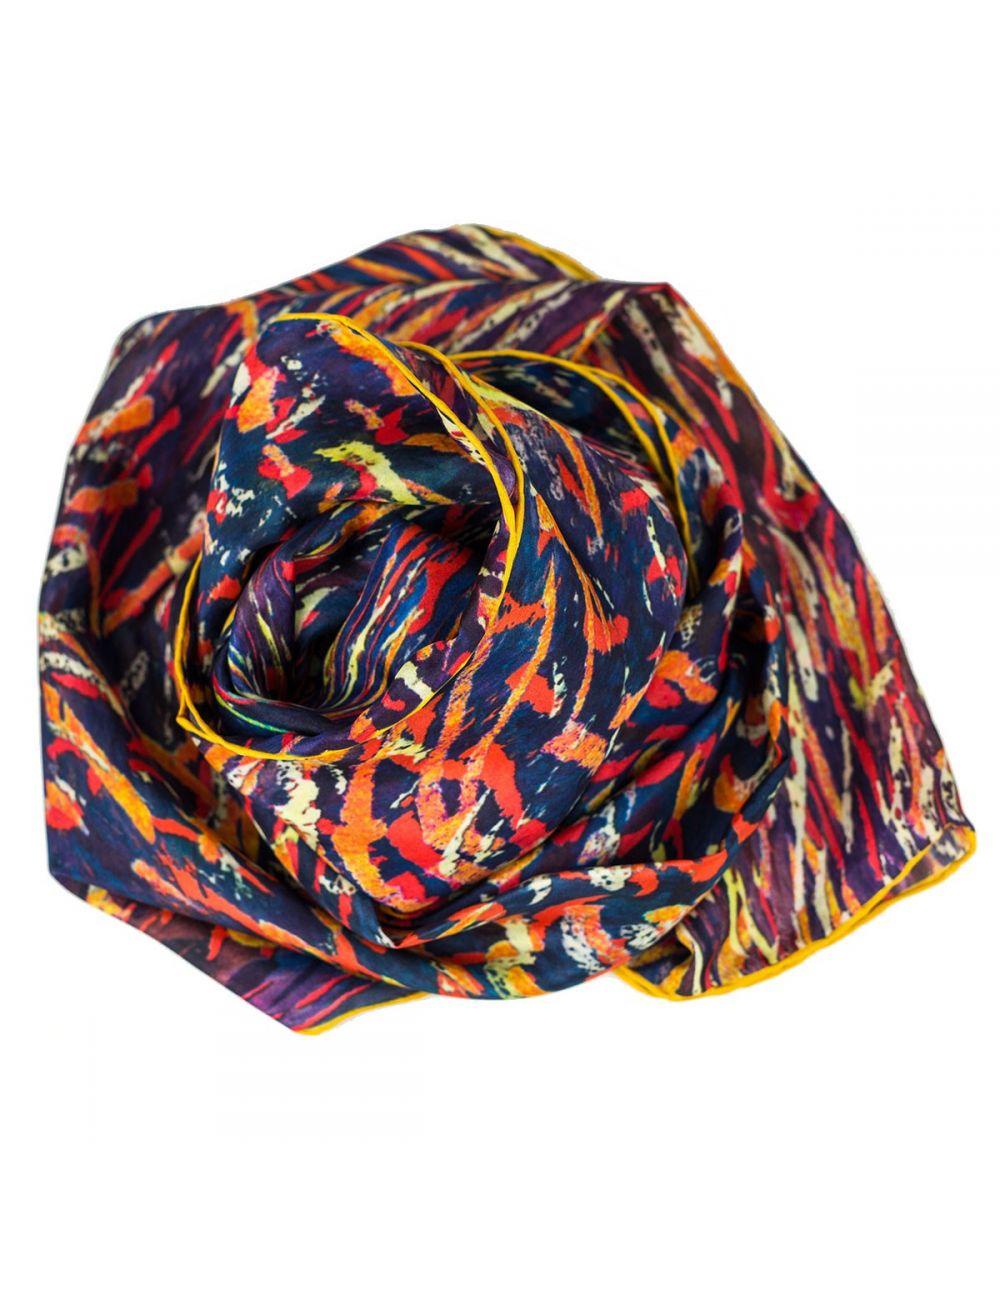 Men's silk scarf